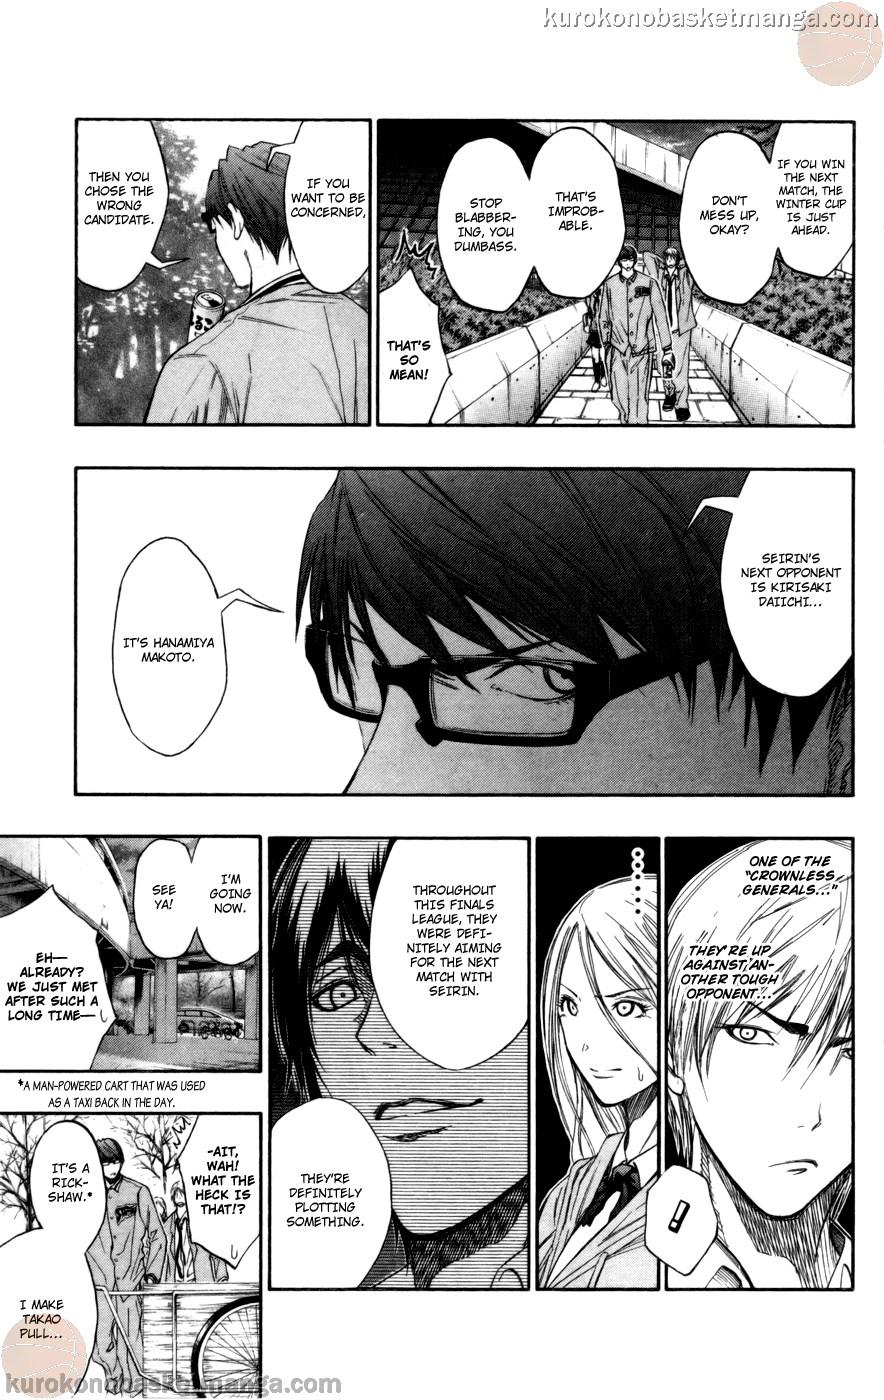 Kuroko no Basket Manga Chapter 93 - Image 13